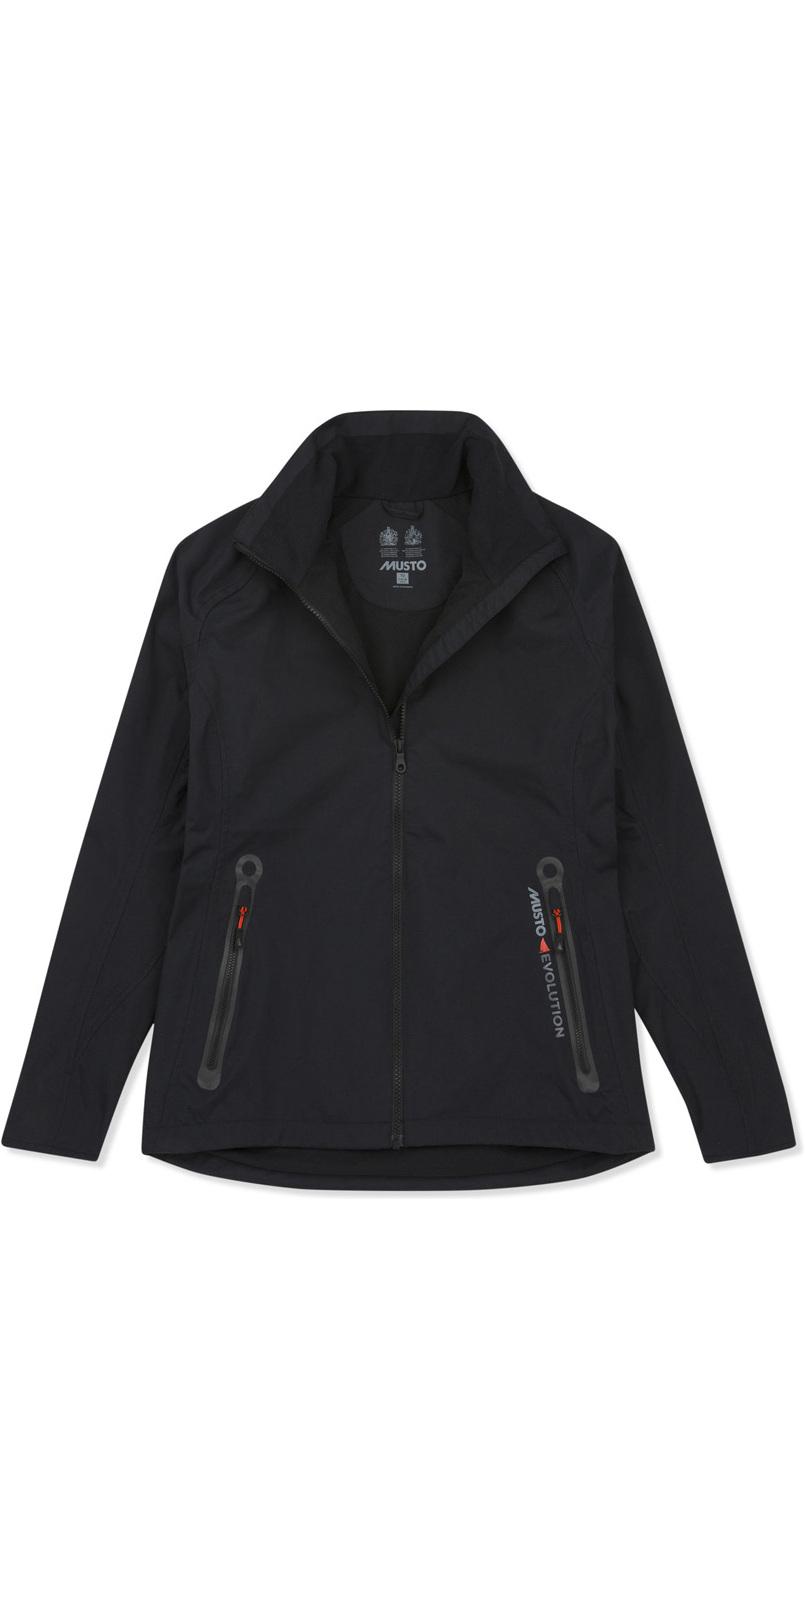 Musto Womens Essential Crew BR1 Jacket BLACK EWJK058 & Apexia Jacket TITANIUM Bundle Offer